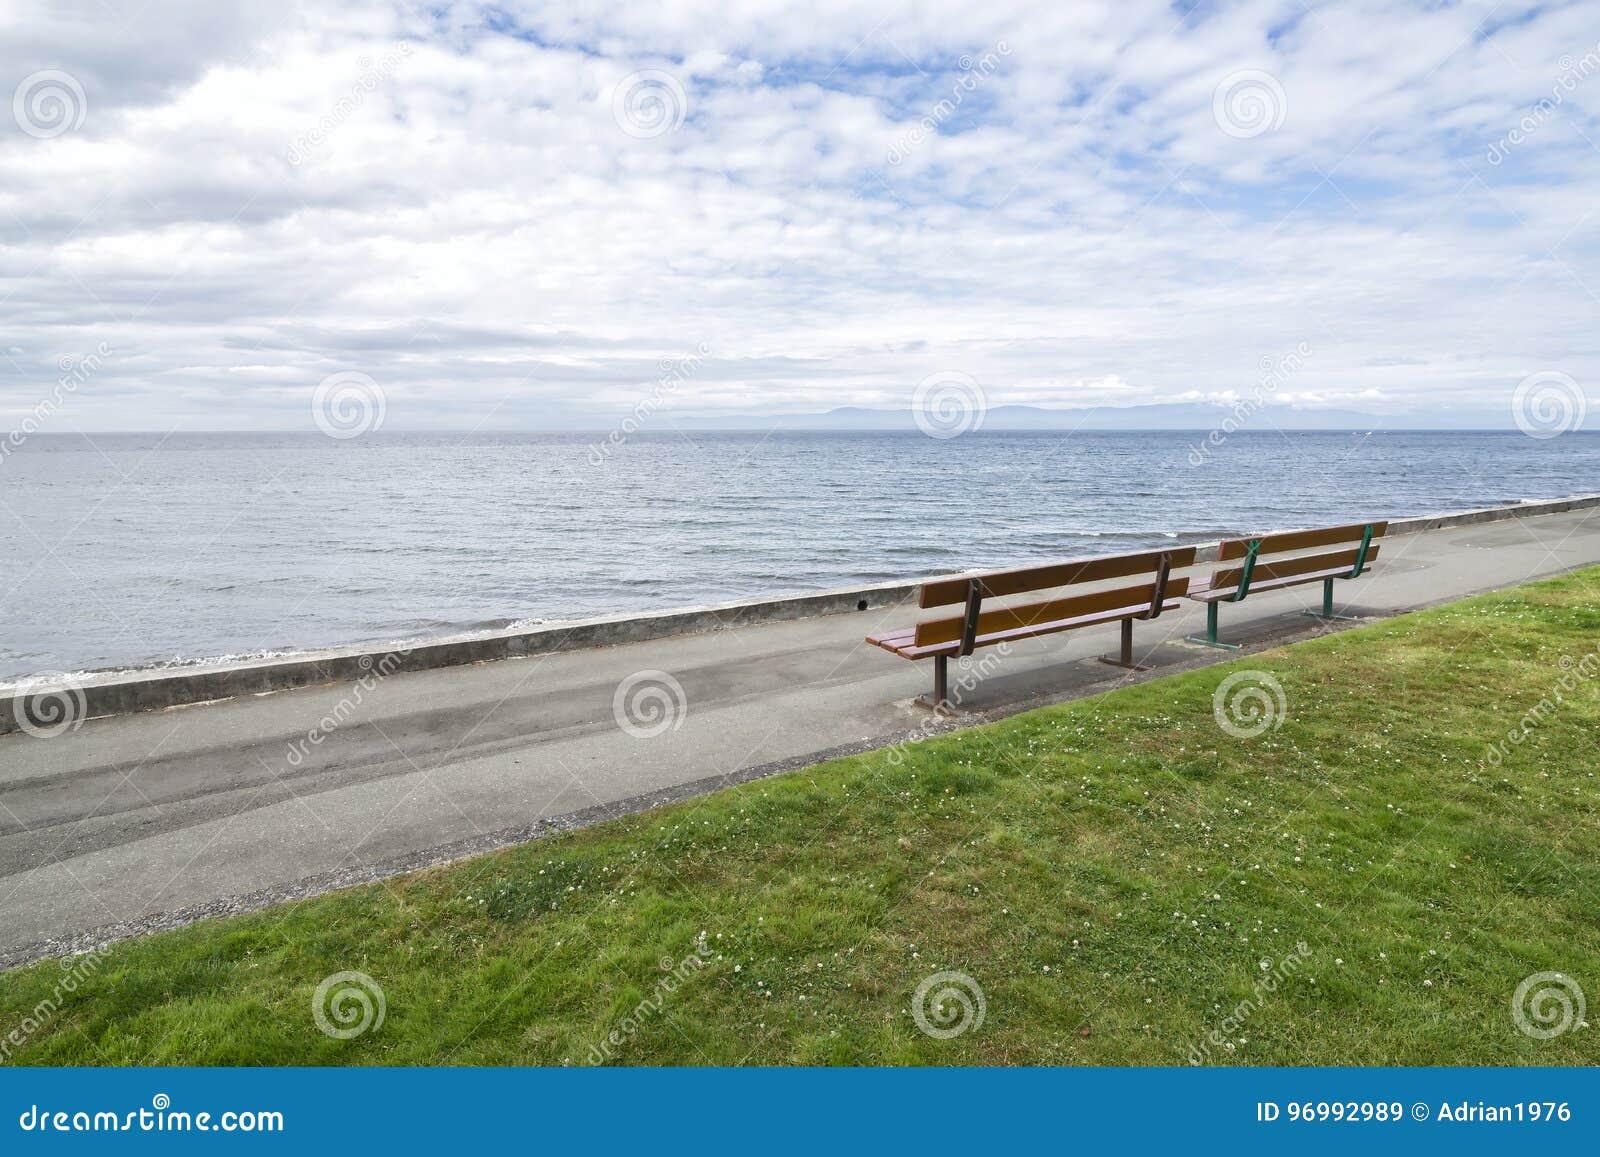 Qualicum Beach Boardwalk In The Summer Stock Image - Image of rock ...